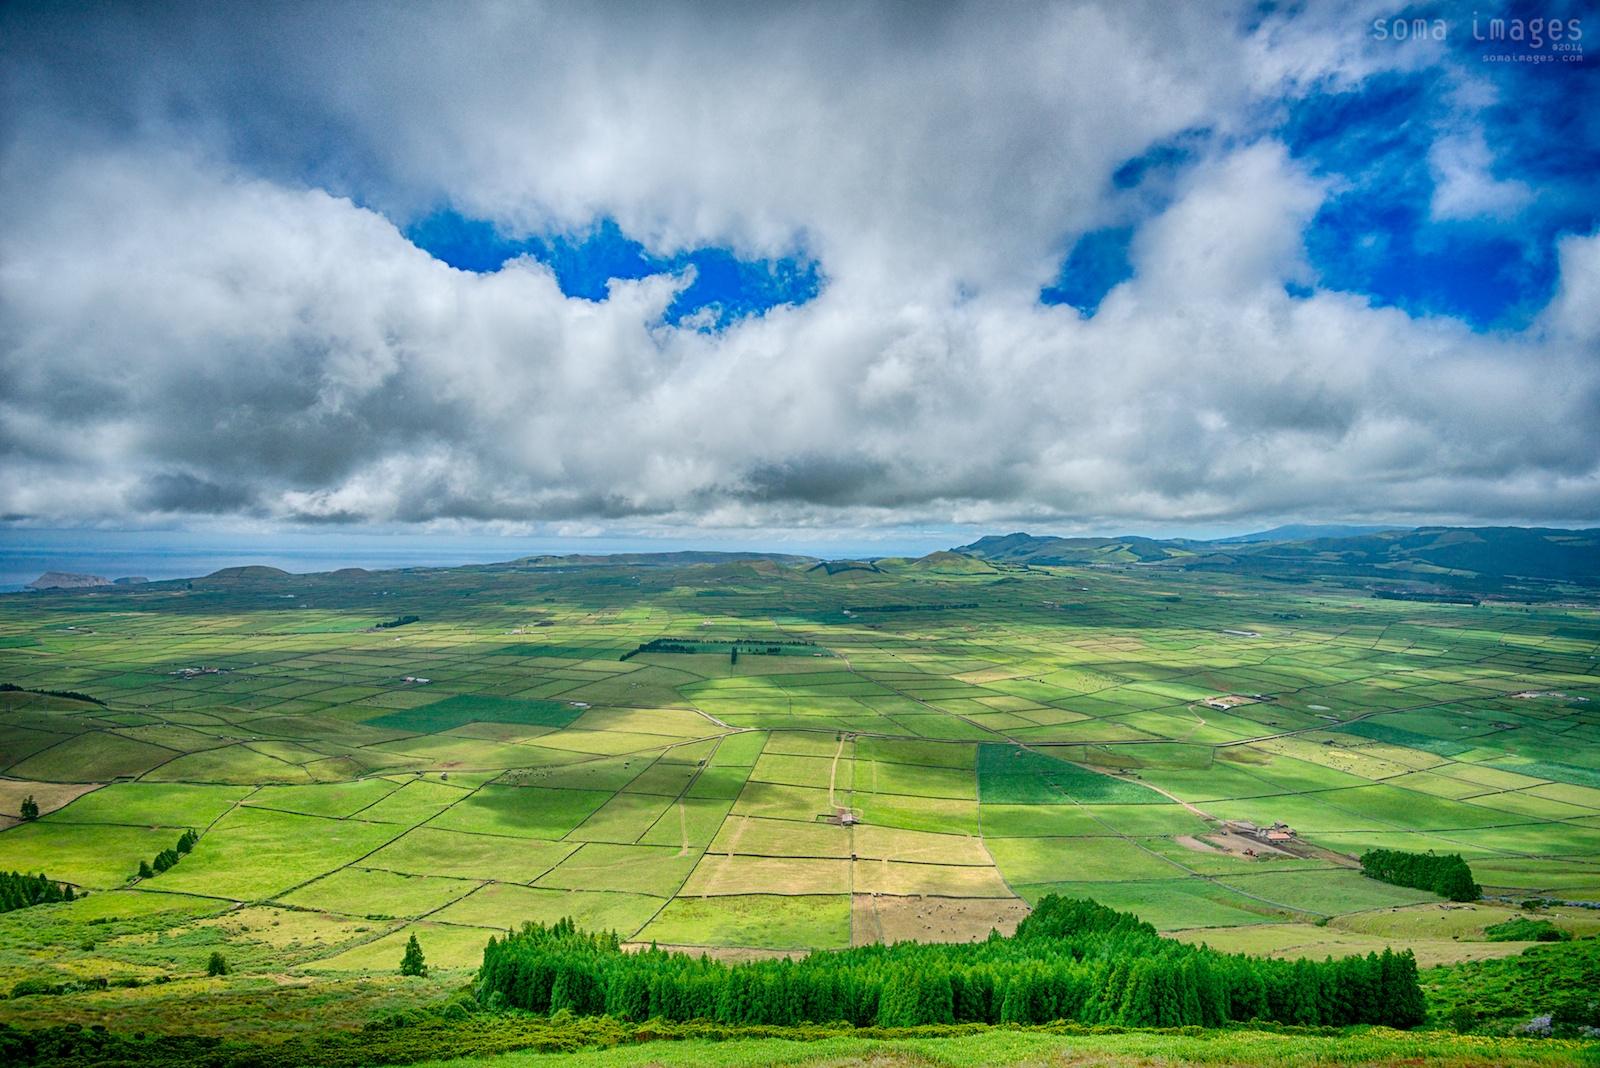 Serra de Cume, Terceira Island, Azores, Portugal